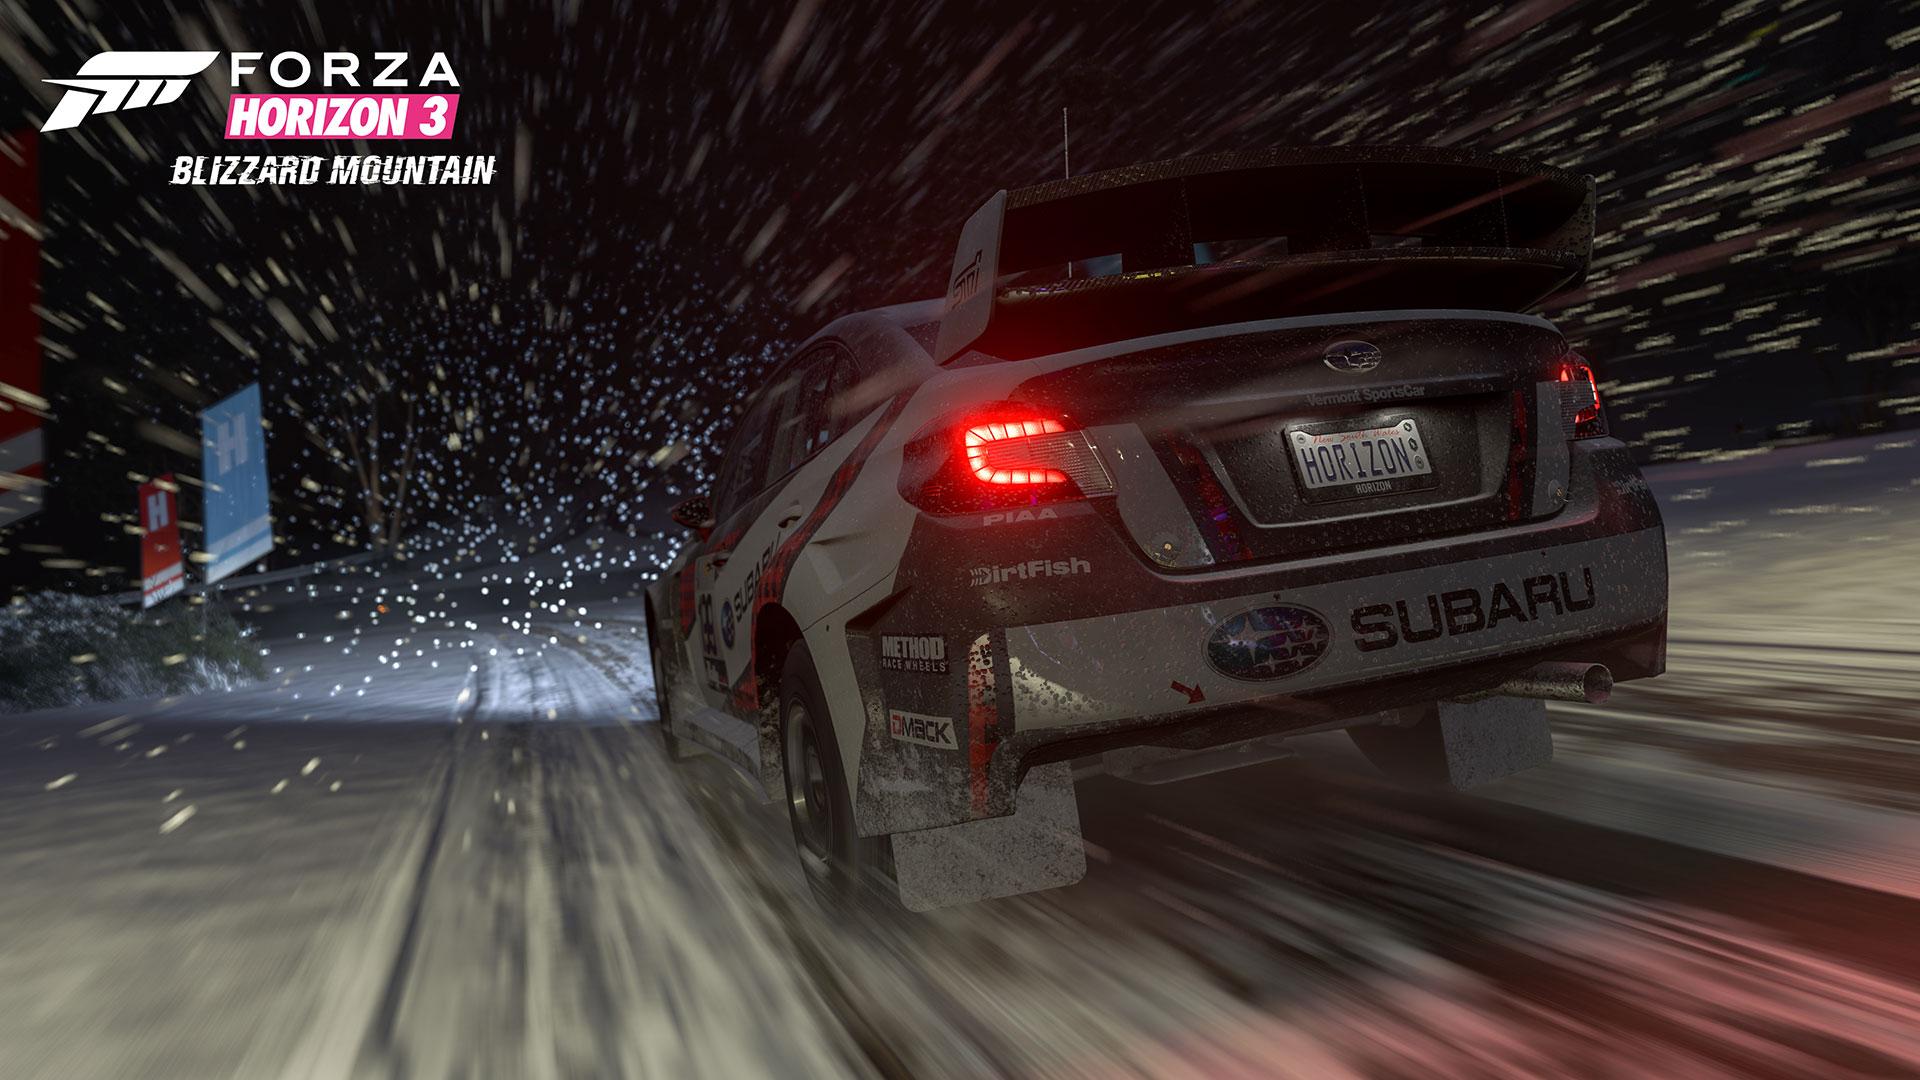 Forza Horizon 3 Blizzard Mountain screenshot 2